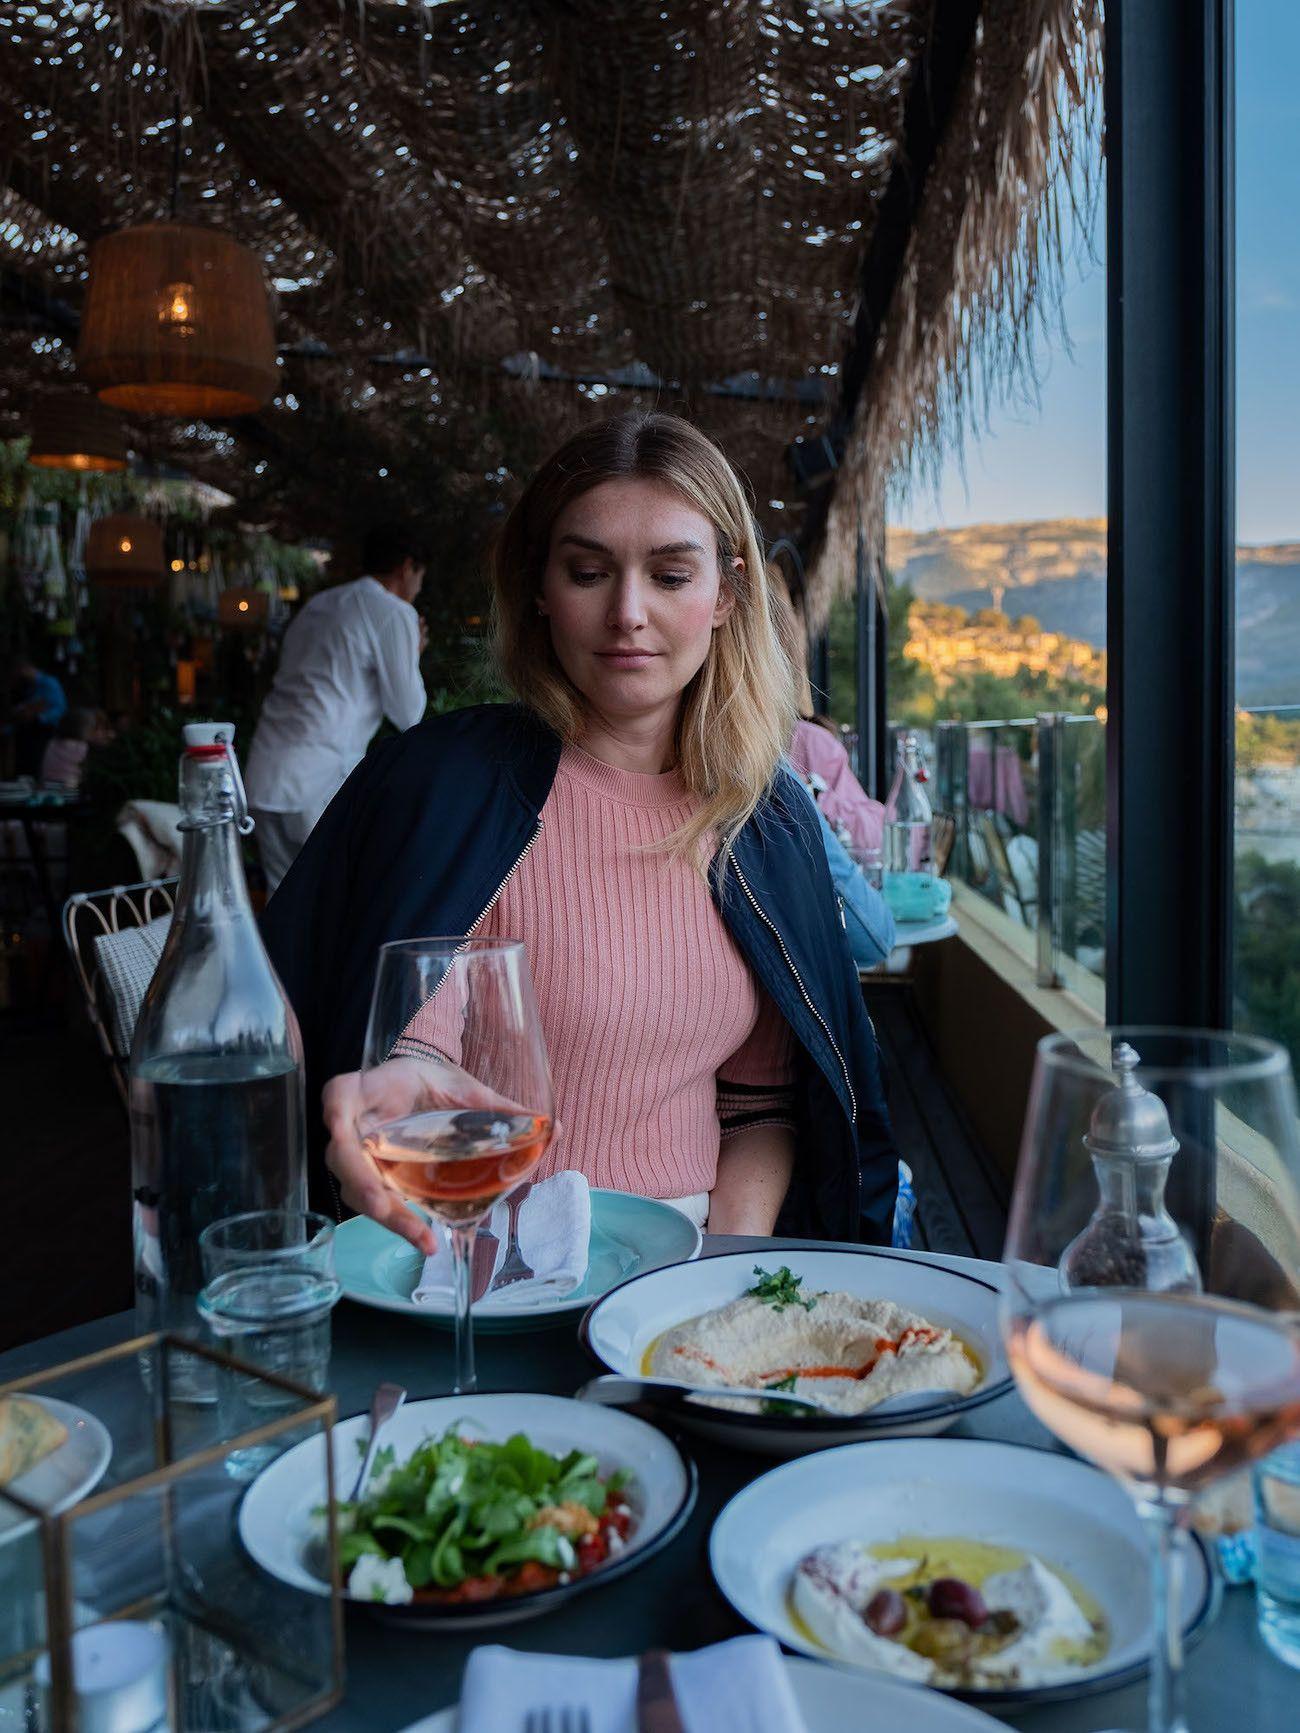 Foodblog About Fuel, Bikini Island & Mountain Hotels, Elina, Wein, Dinner